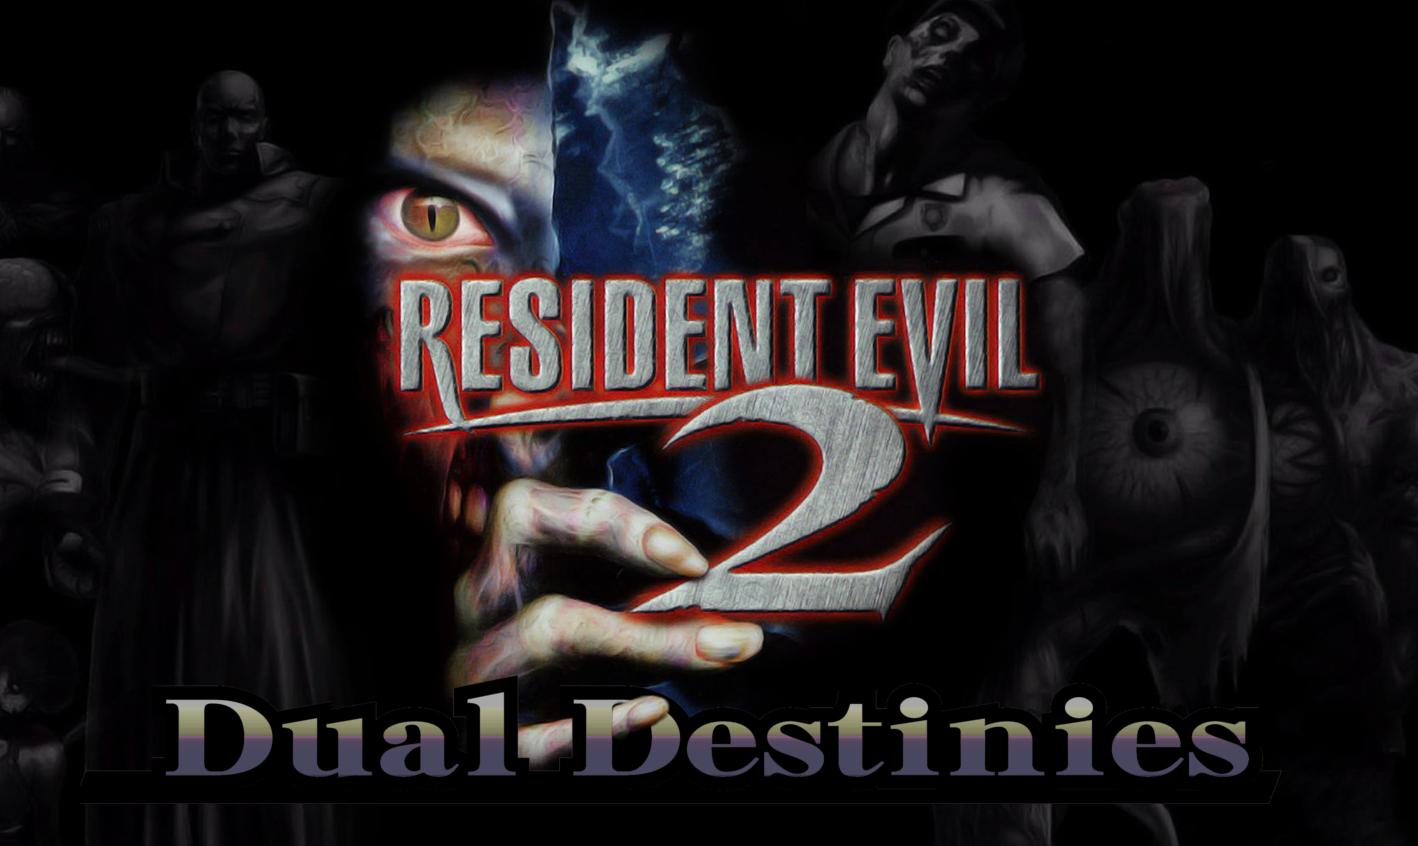 [April Fools'] Preview: Resident Evil 2: Dual Destinies